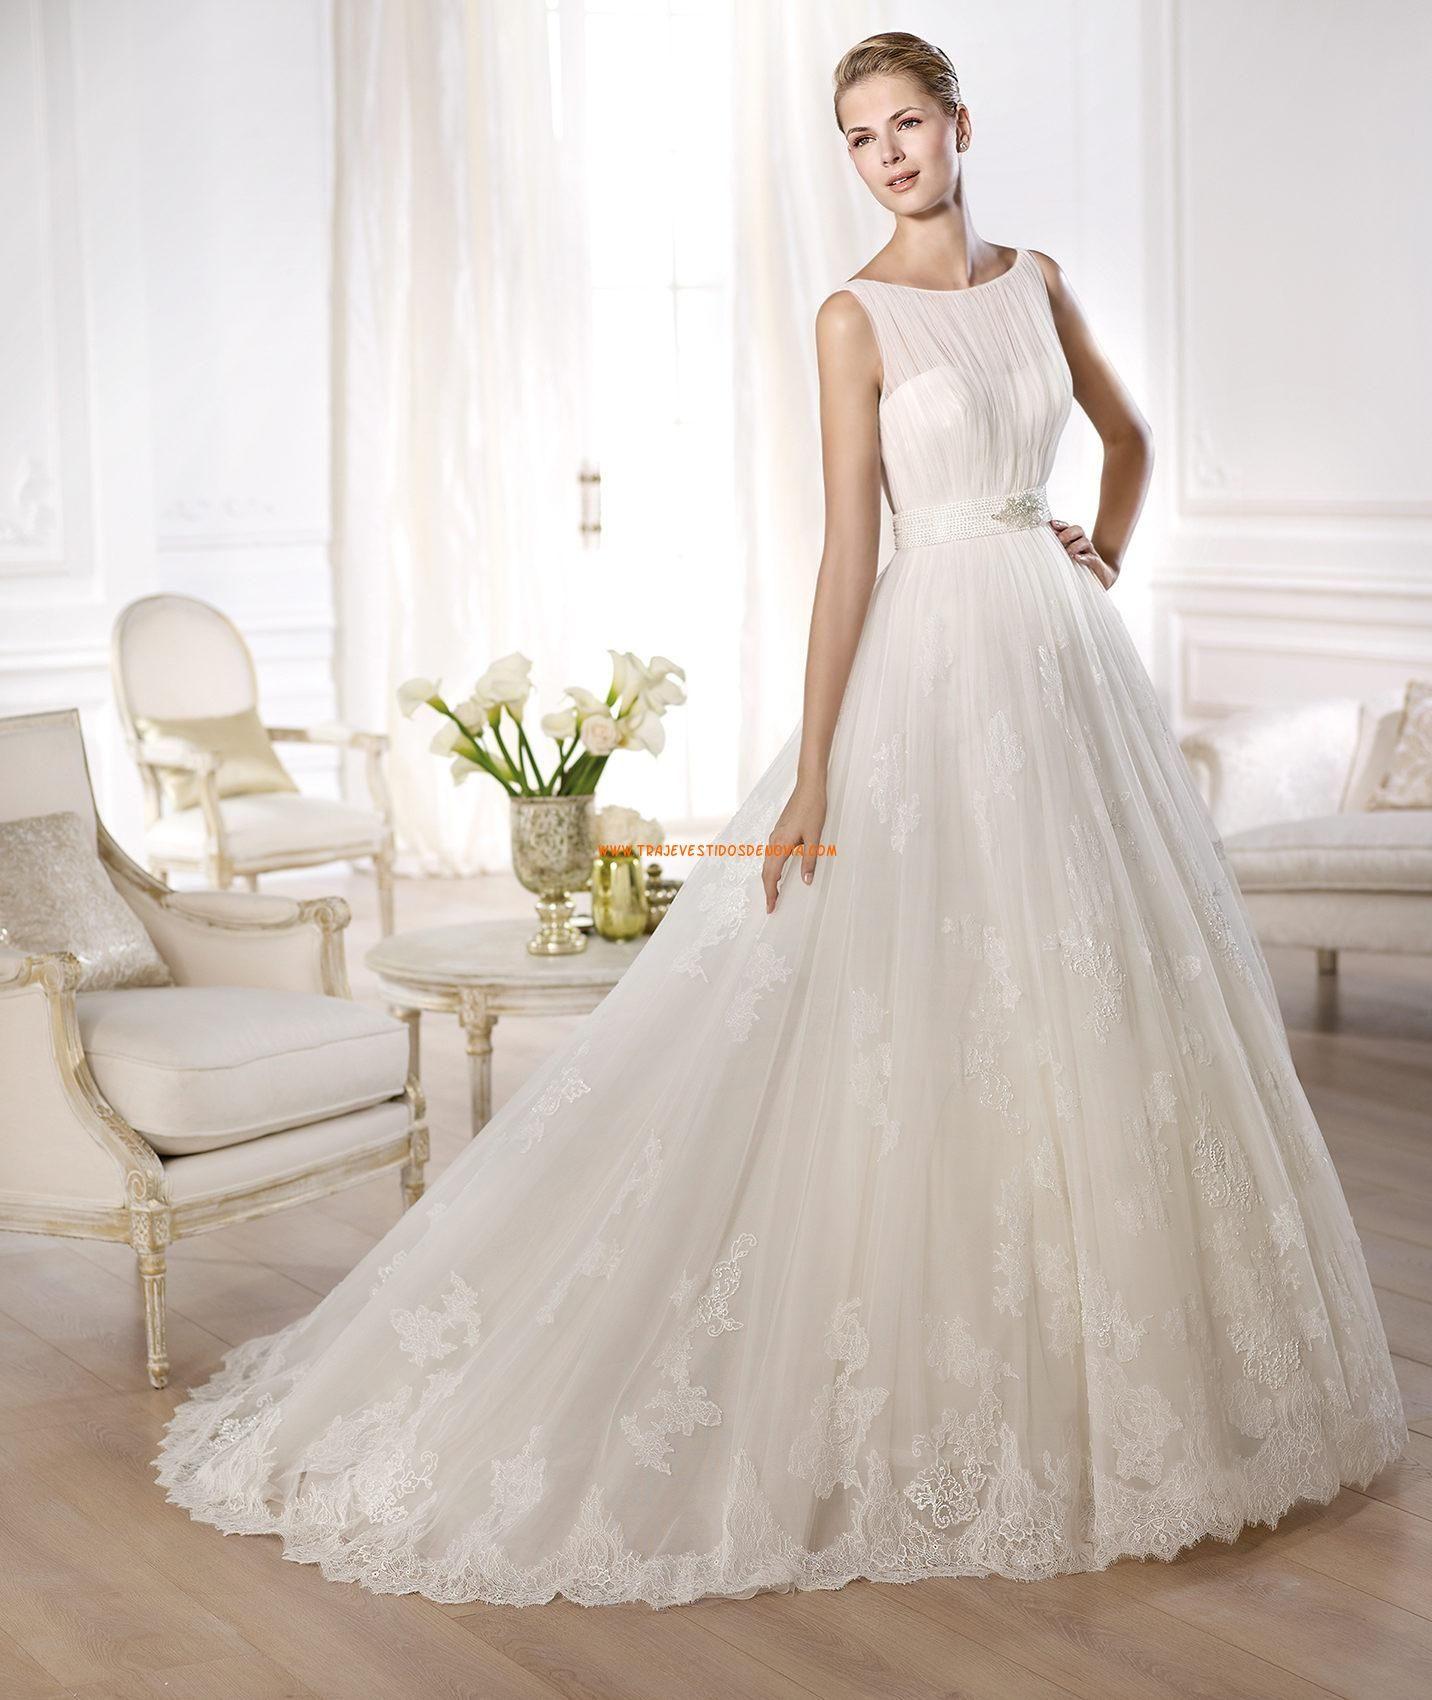 Asombroso Aclaramiento De Vestidos De Novia Ideas Ornamento ...